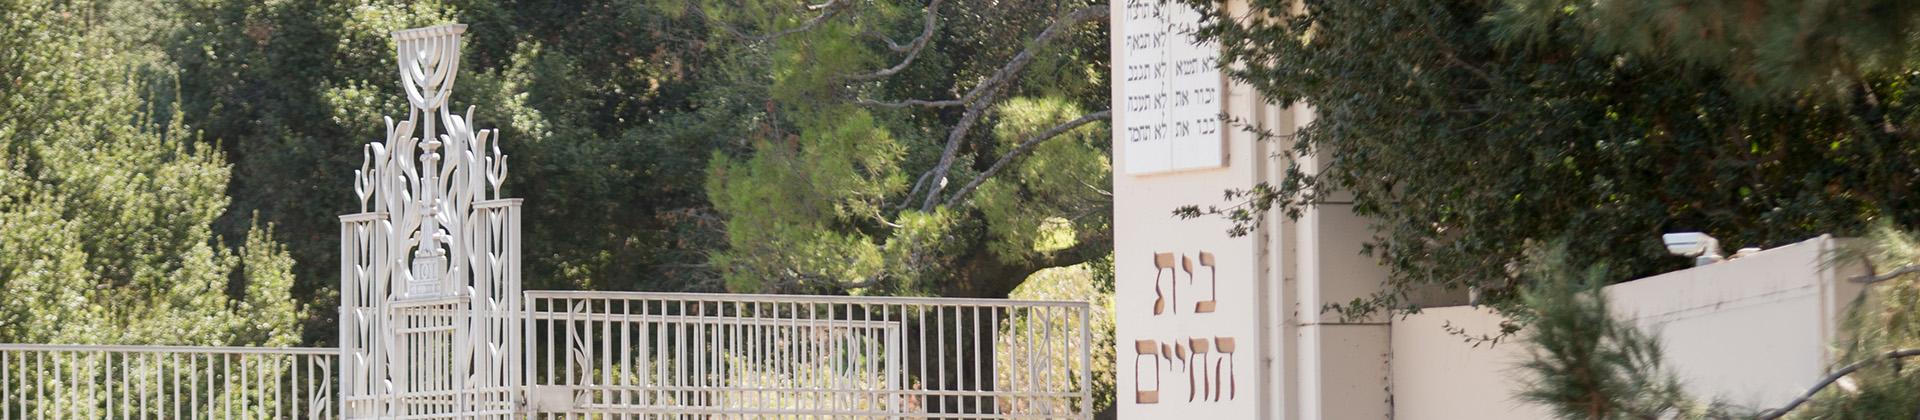 Header photo of Mount Sinai entrance gates